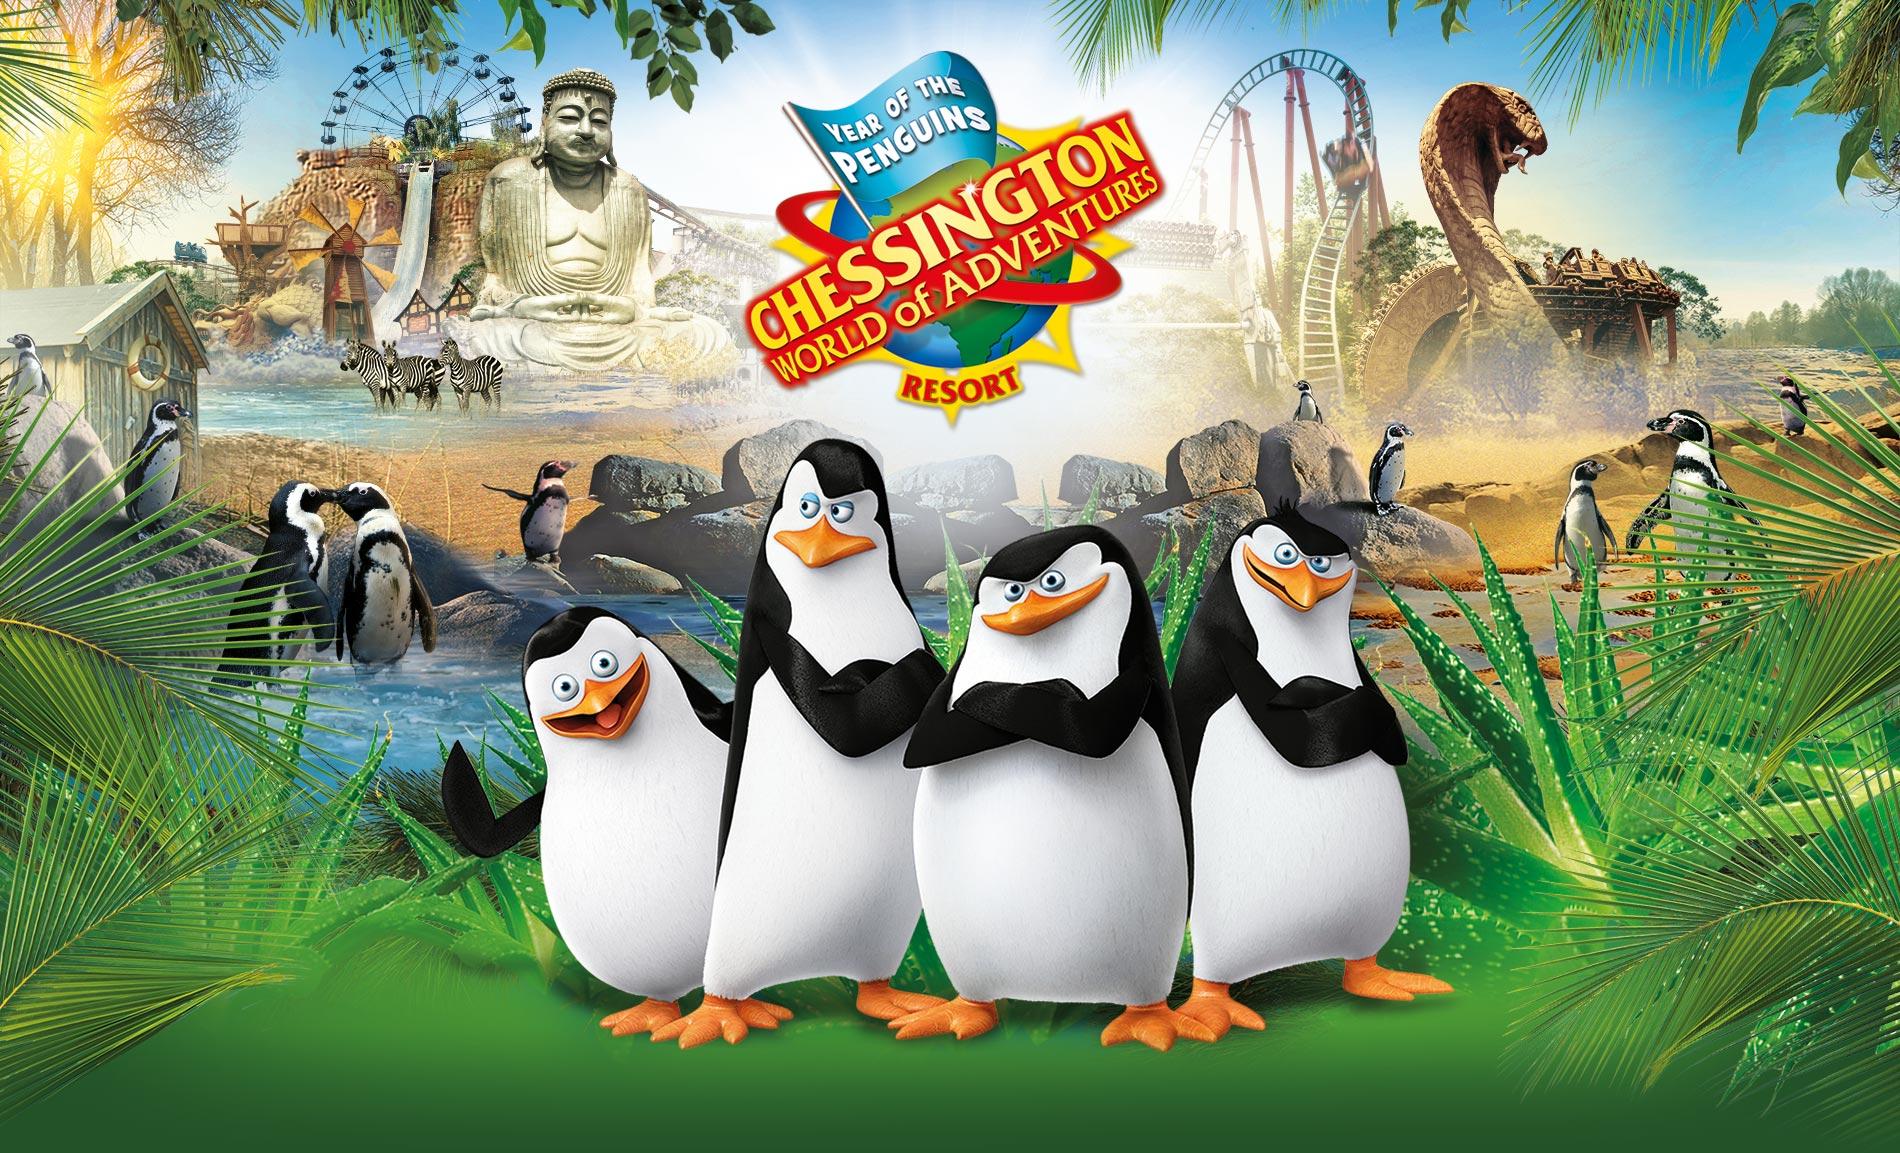 Penguins of MADAGASCAR kidschaos